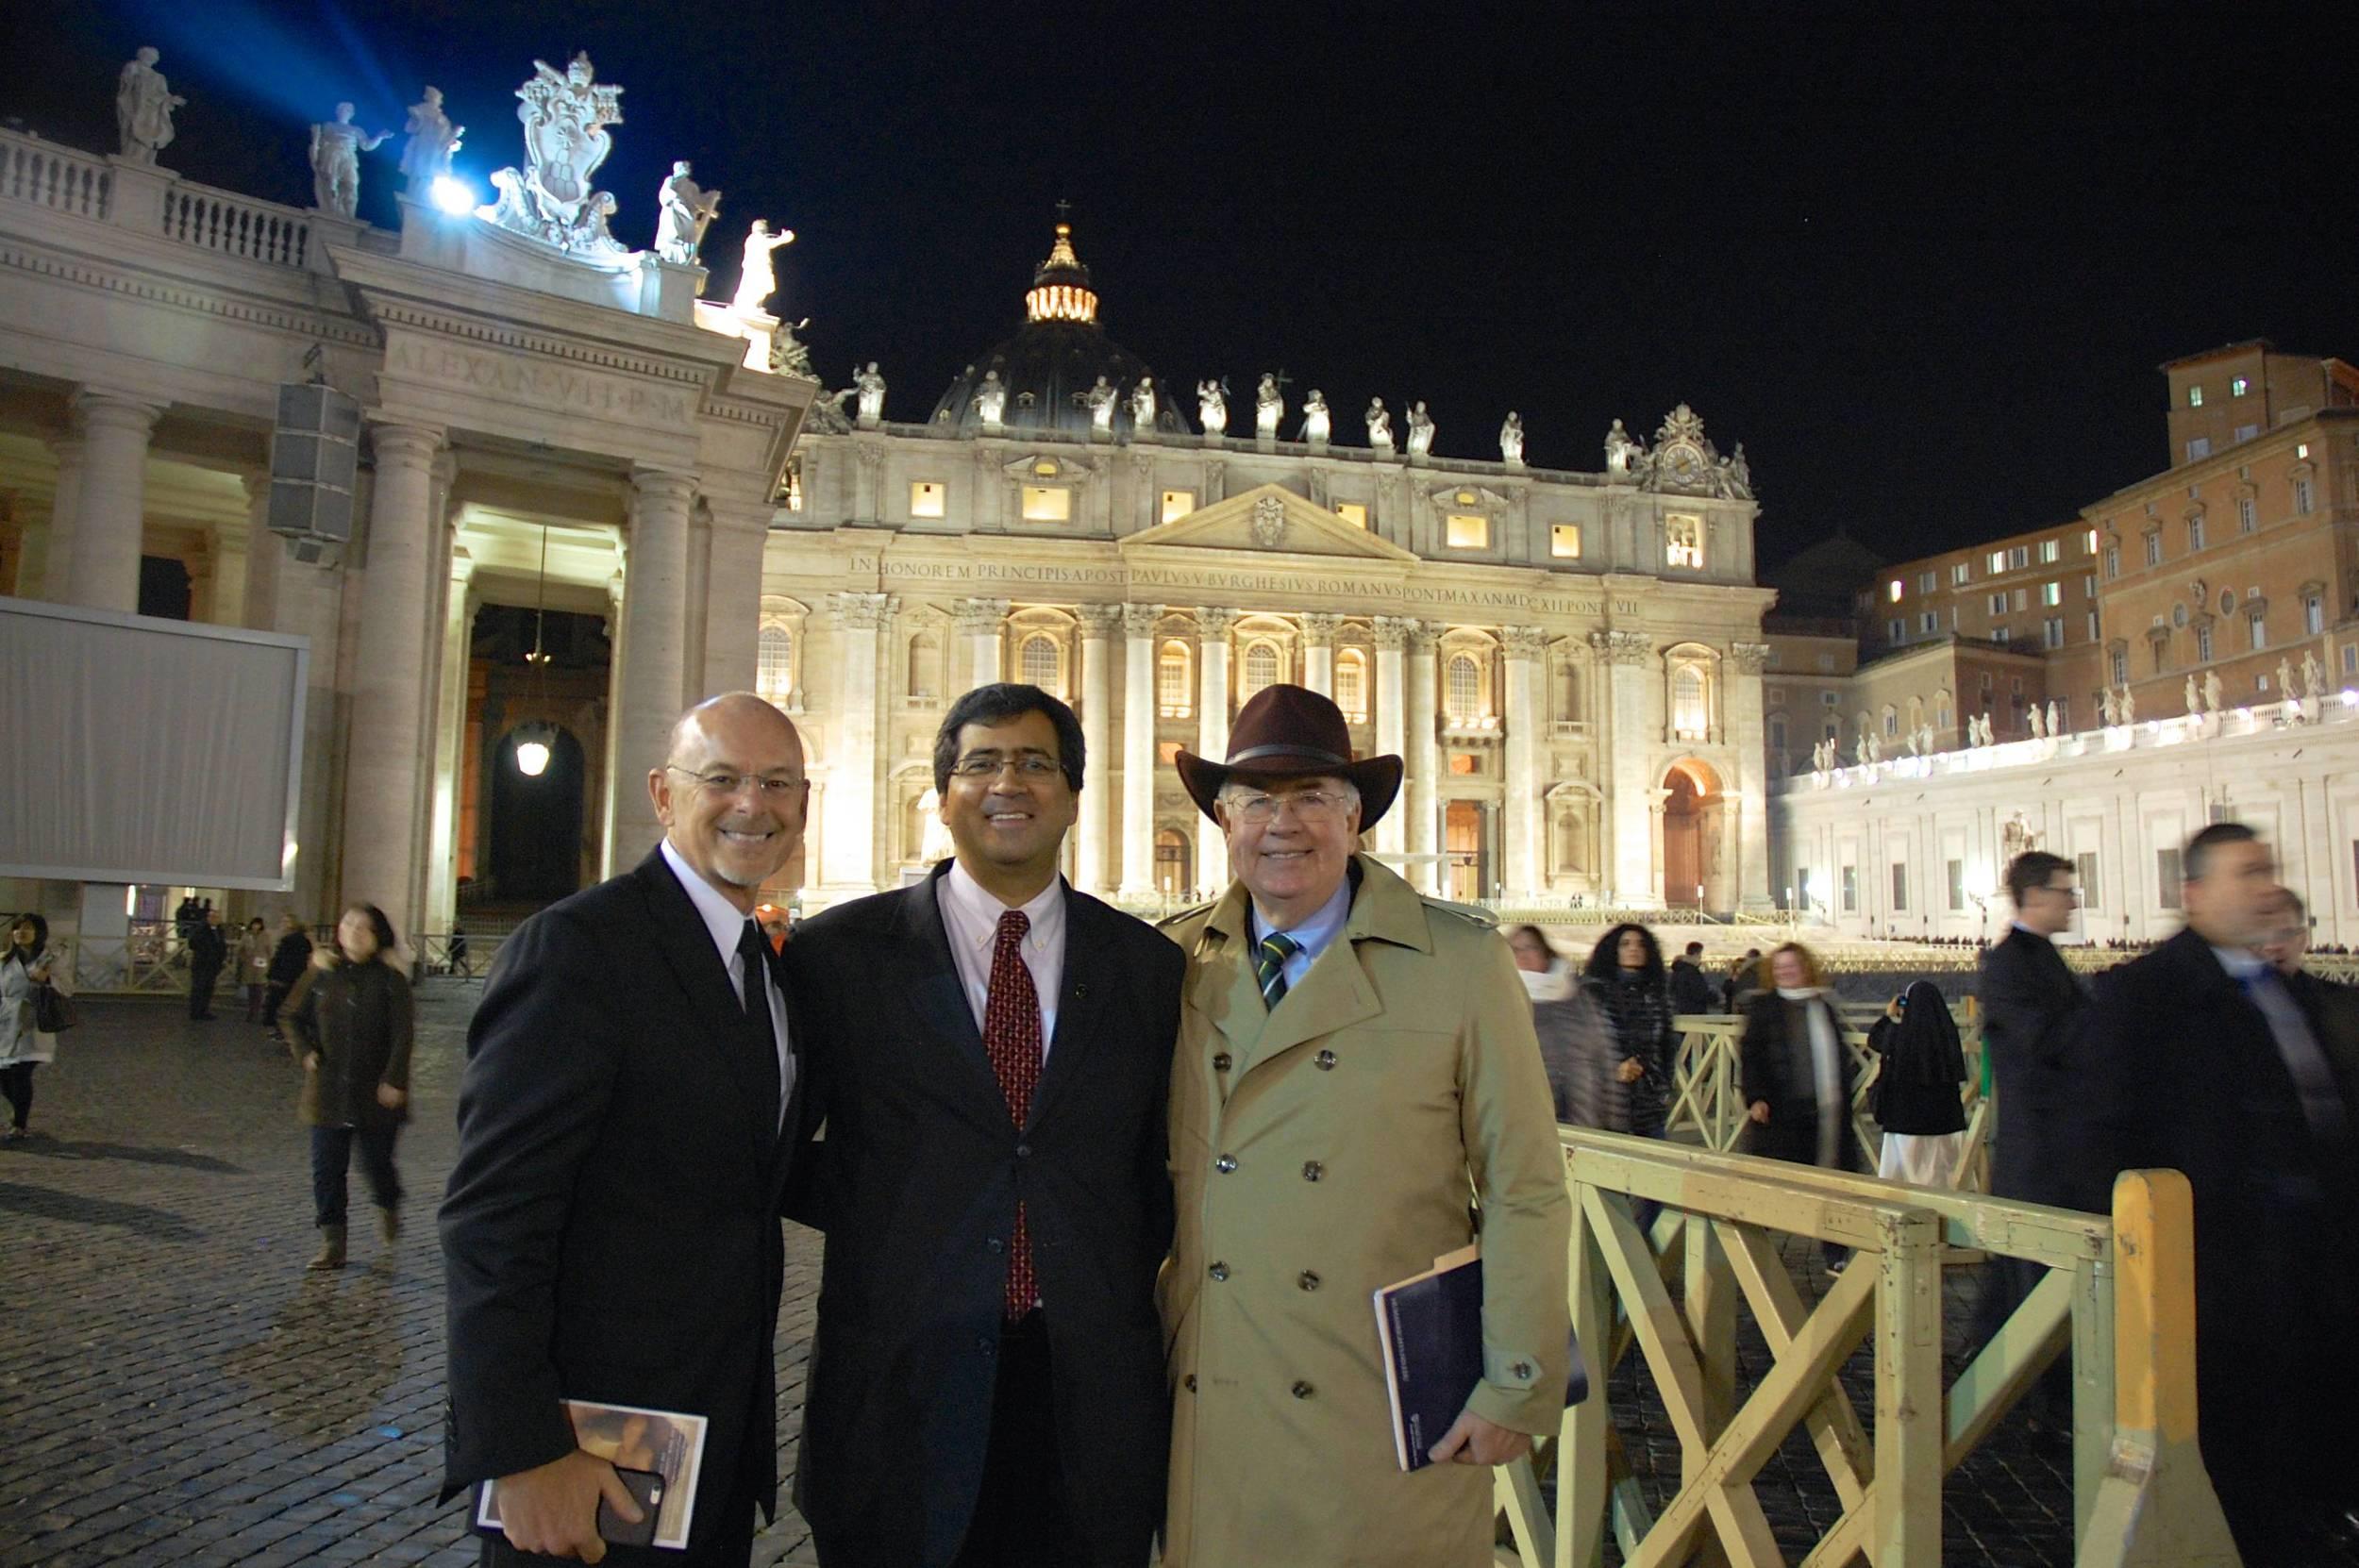 Byron Johnson, Tim Shah, and Ken Starr at St. Peter's Basilica.